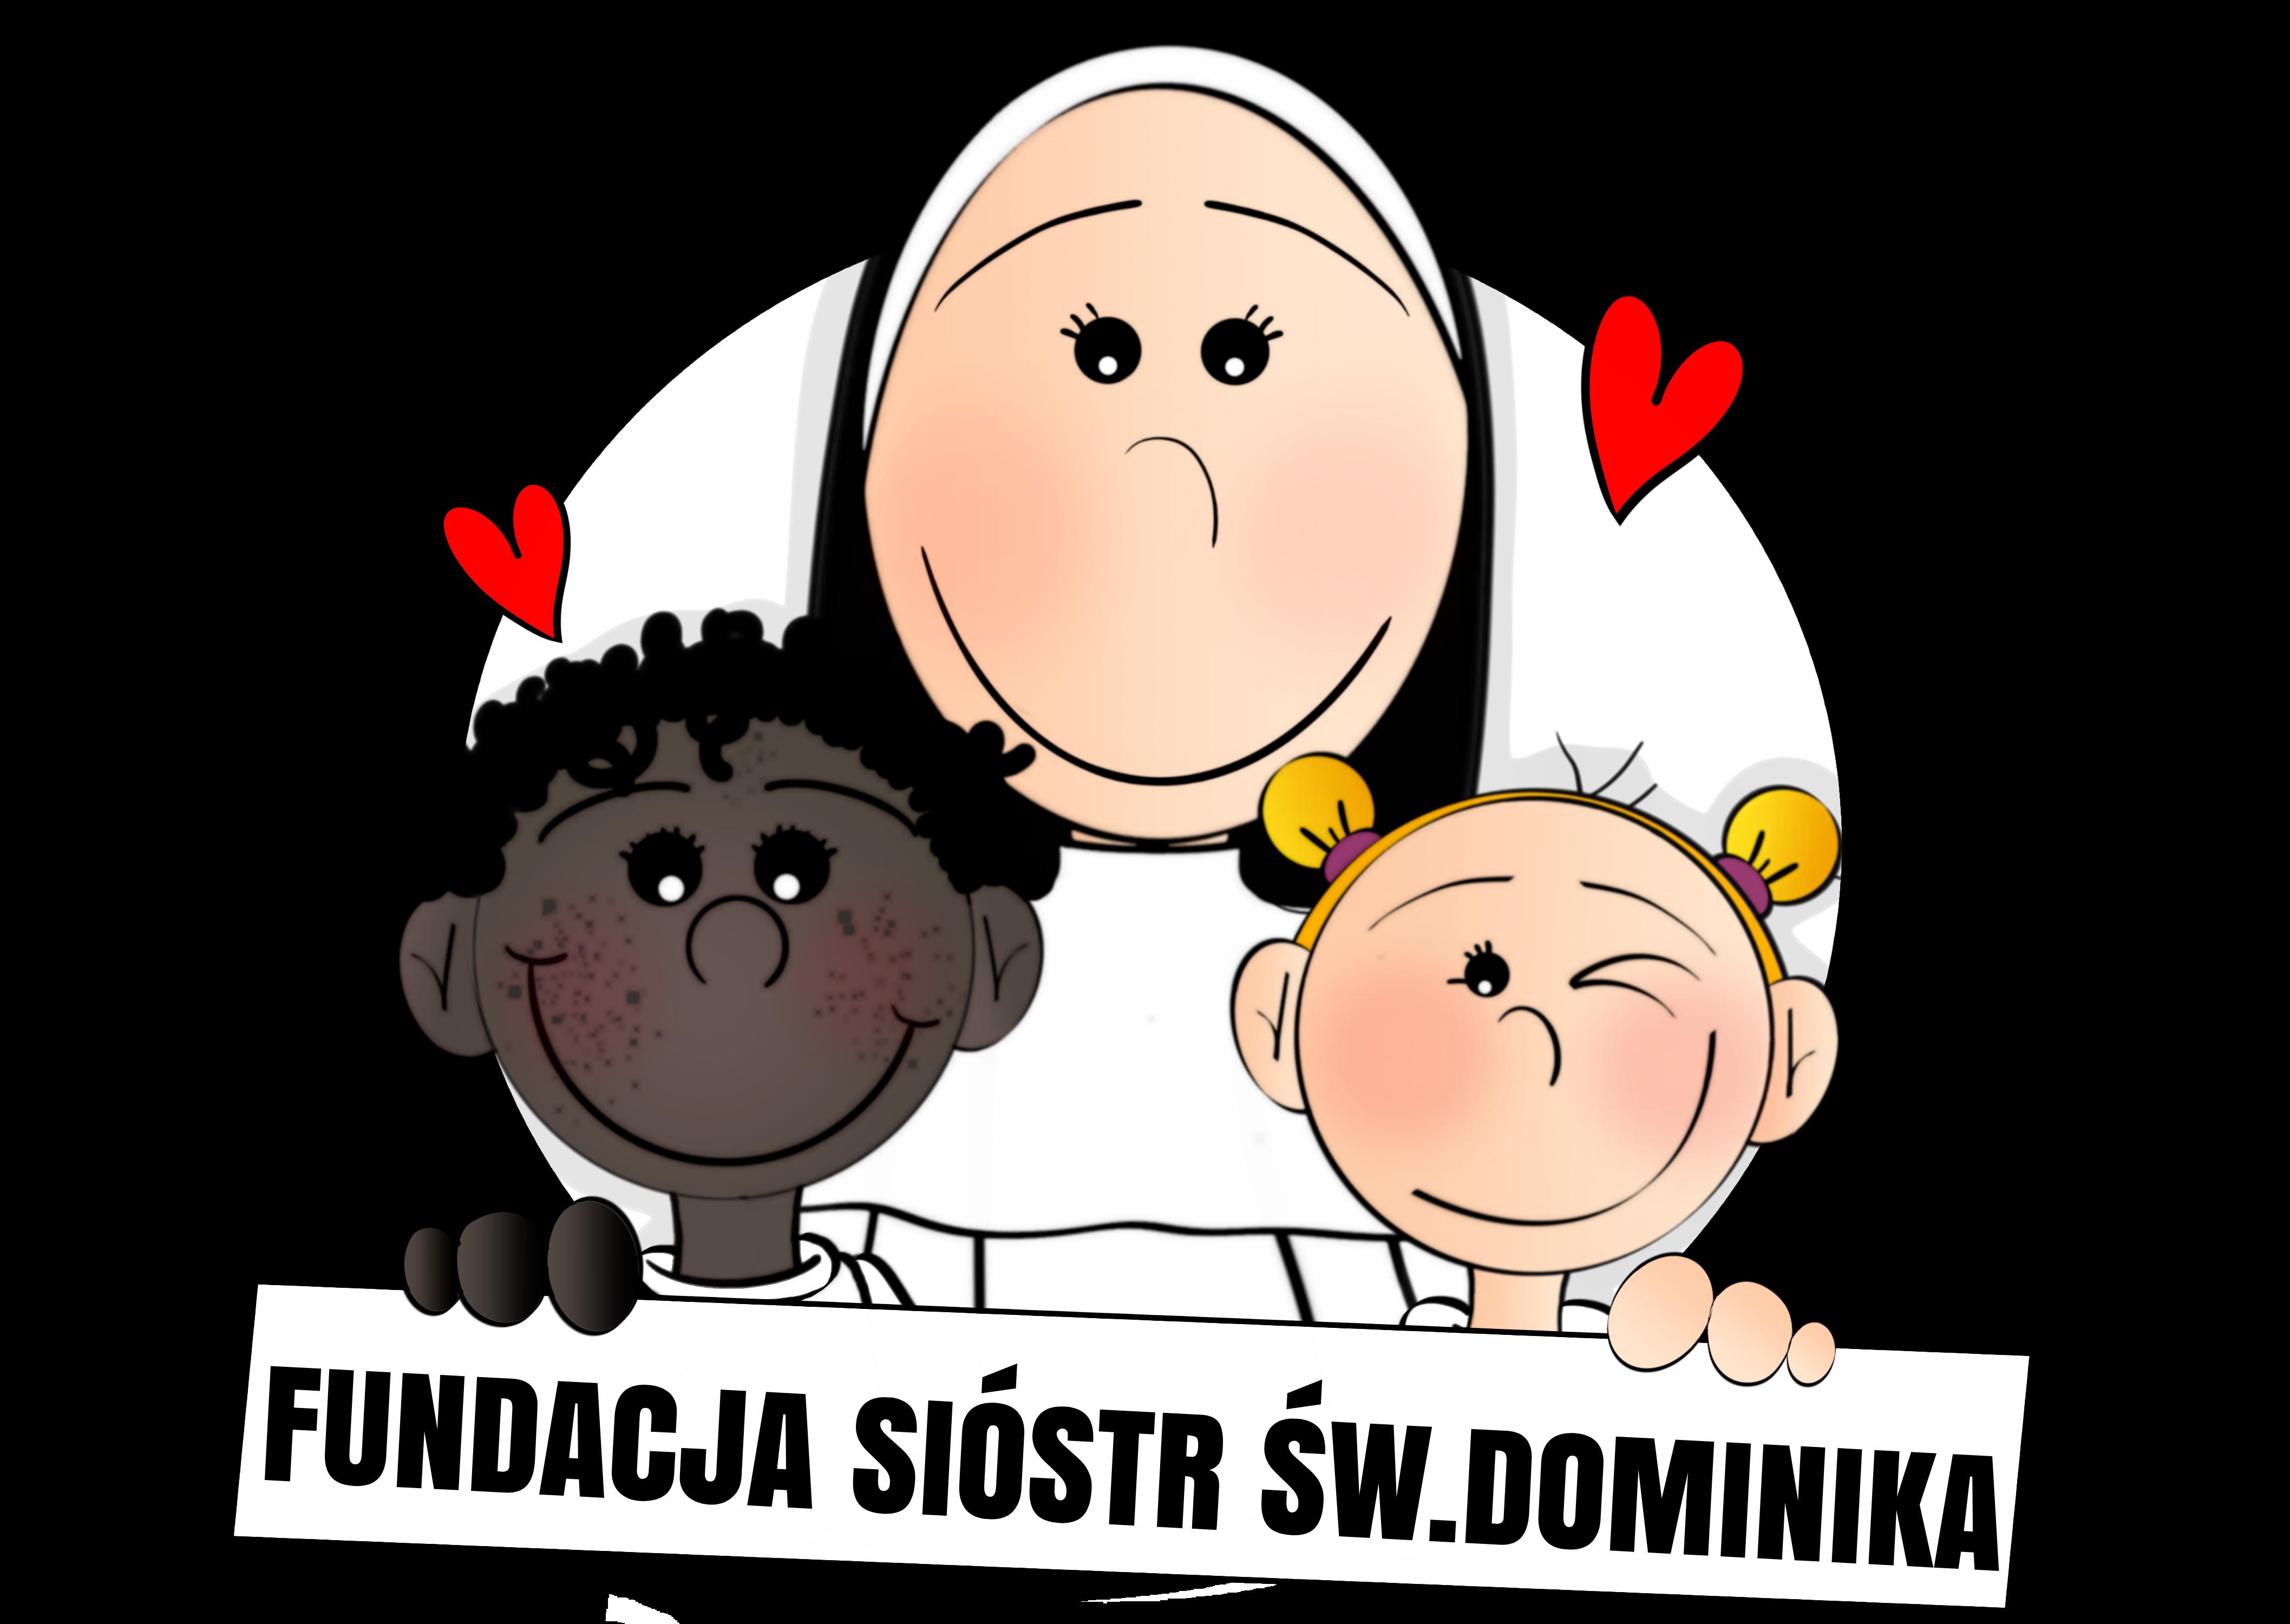 Fundacja Sióstr św. Dominika